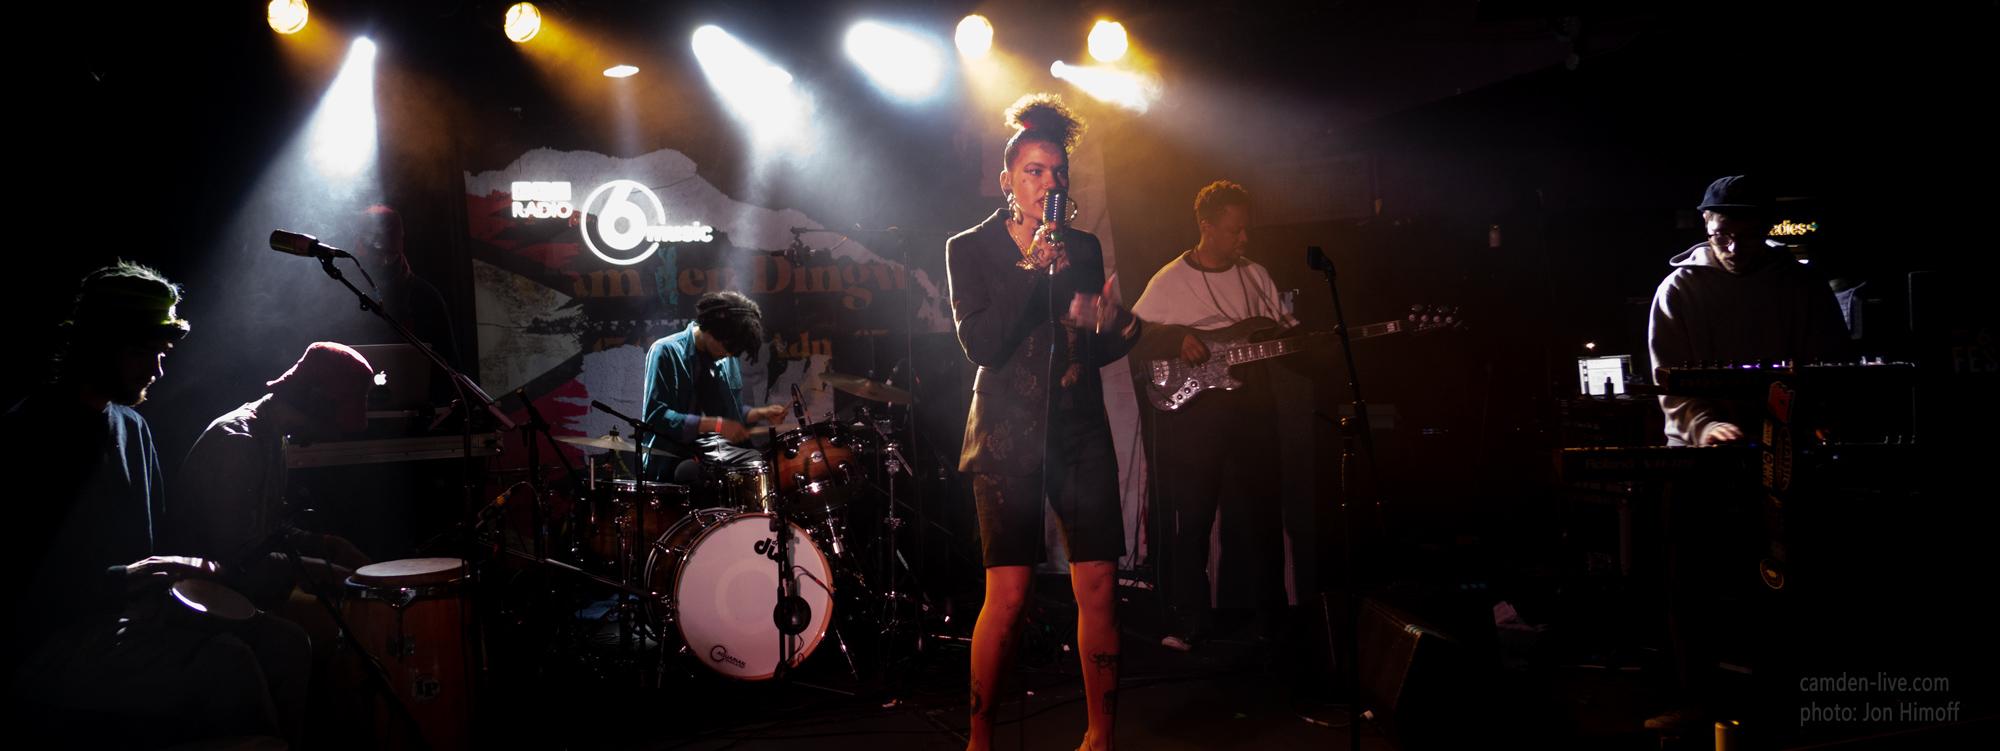 Greentea Peng Kicks Off BBC 6 Music Festival